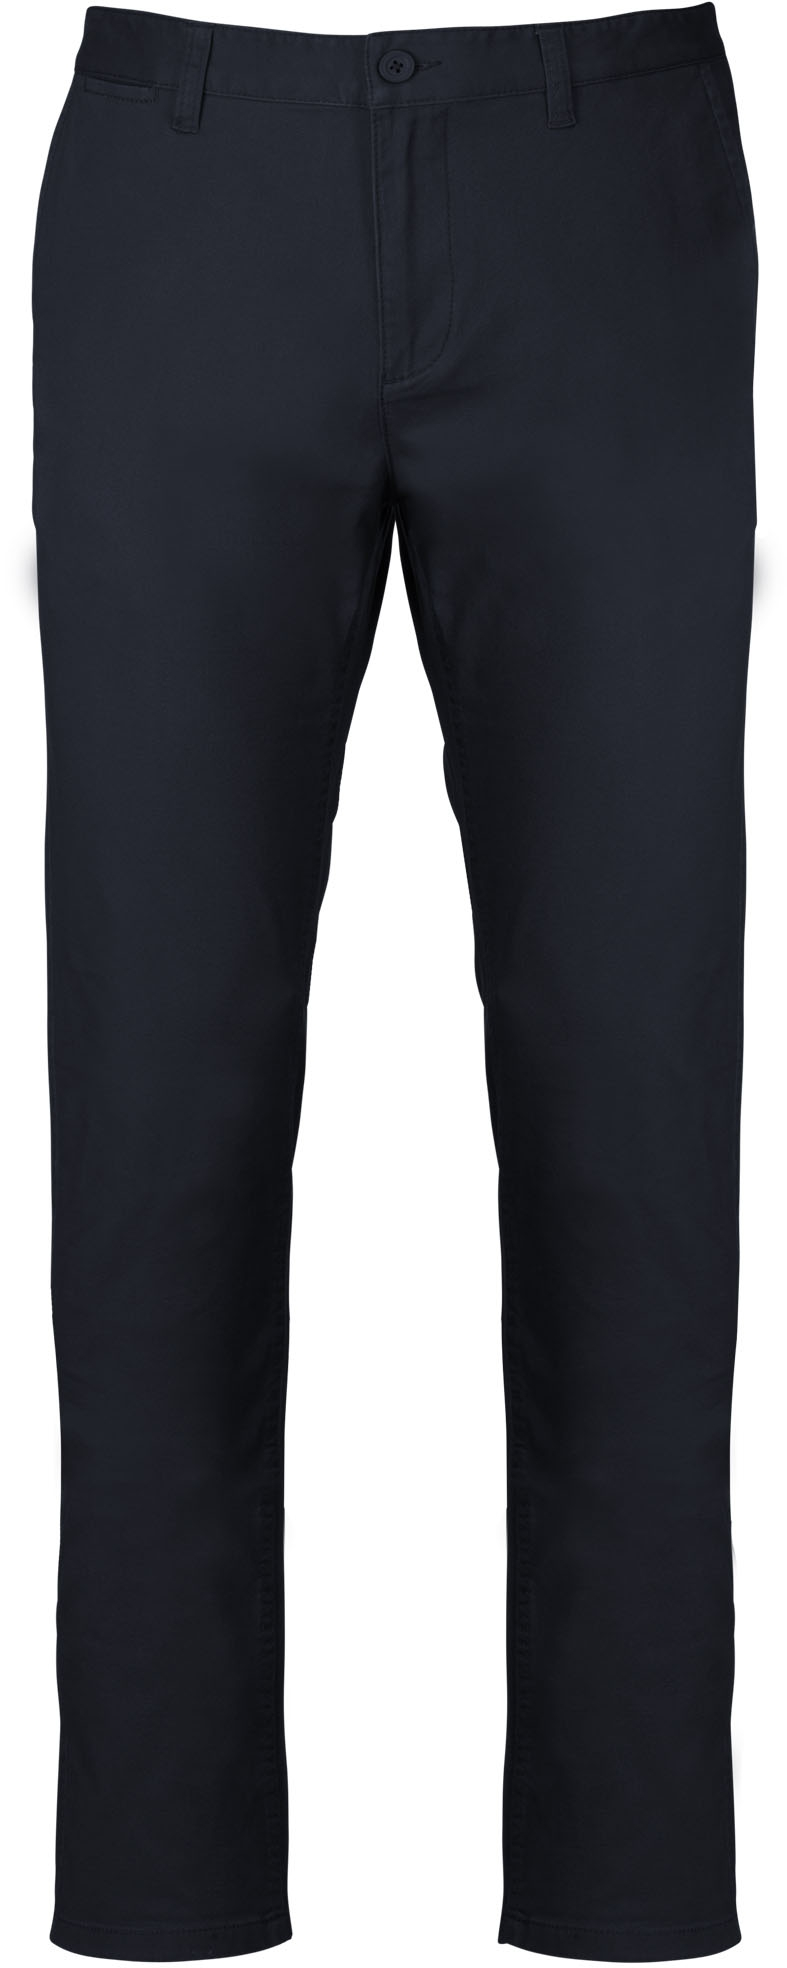 Pantalon chino homme - 2-1478-6